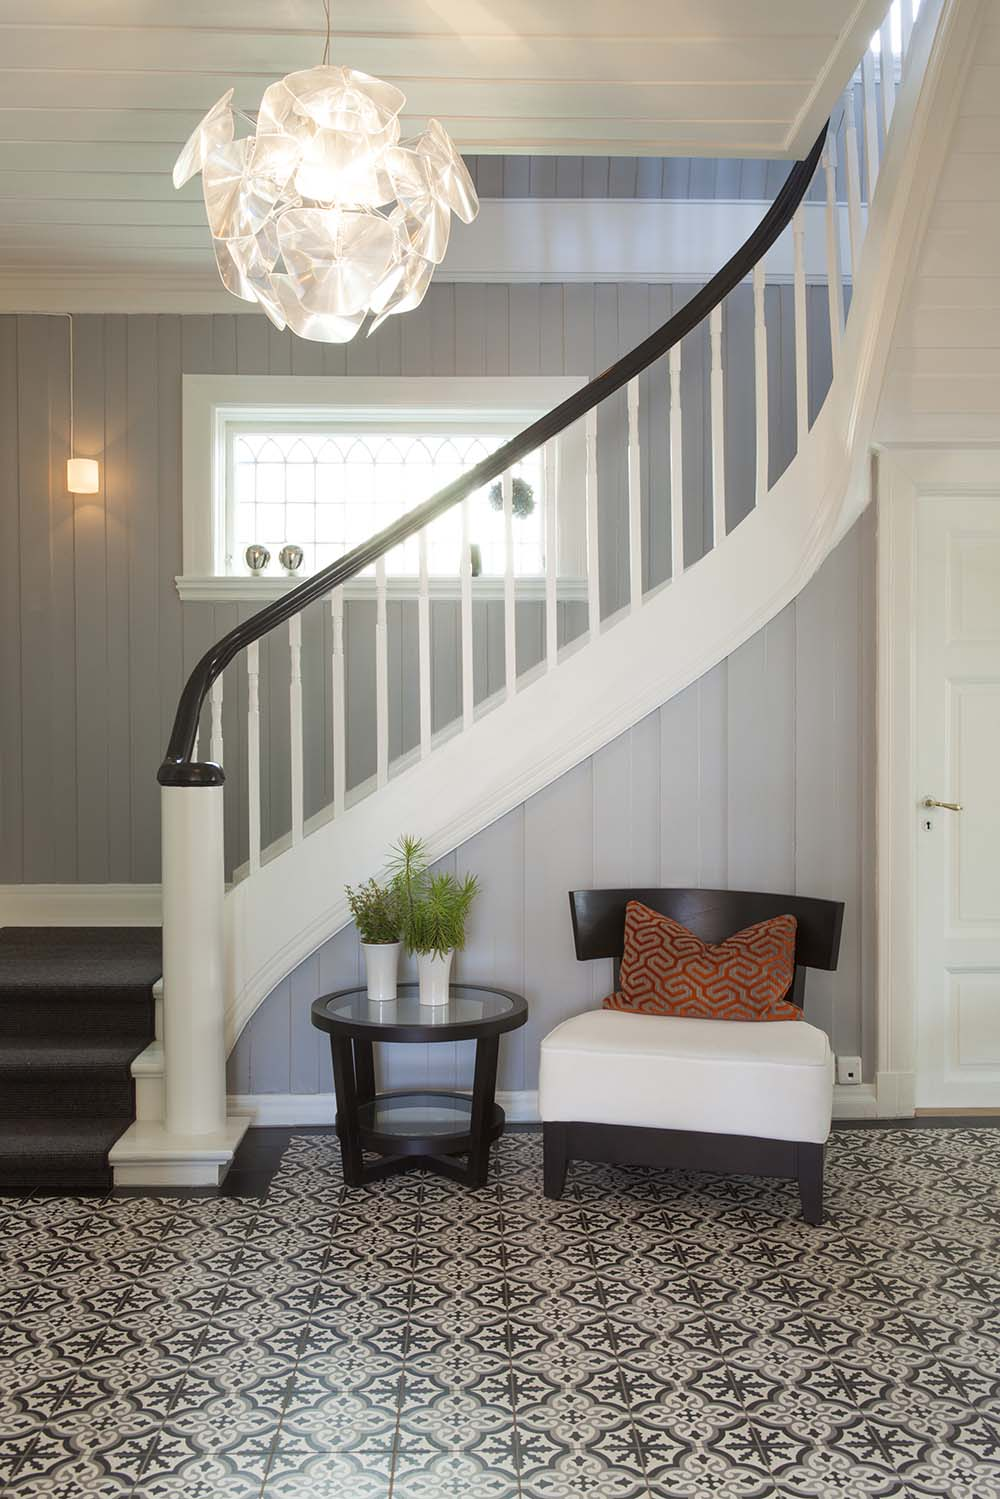 foaje, trappeoppgang, trapp, interiør